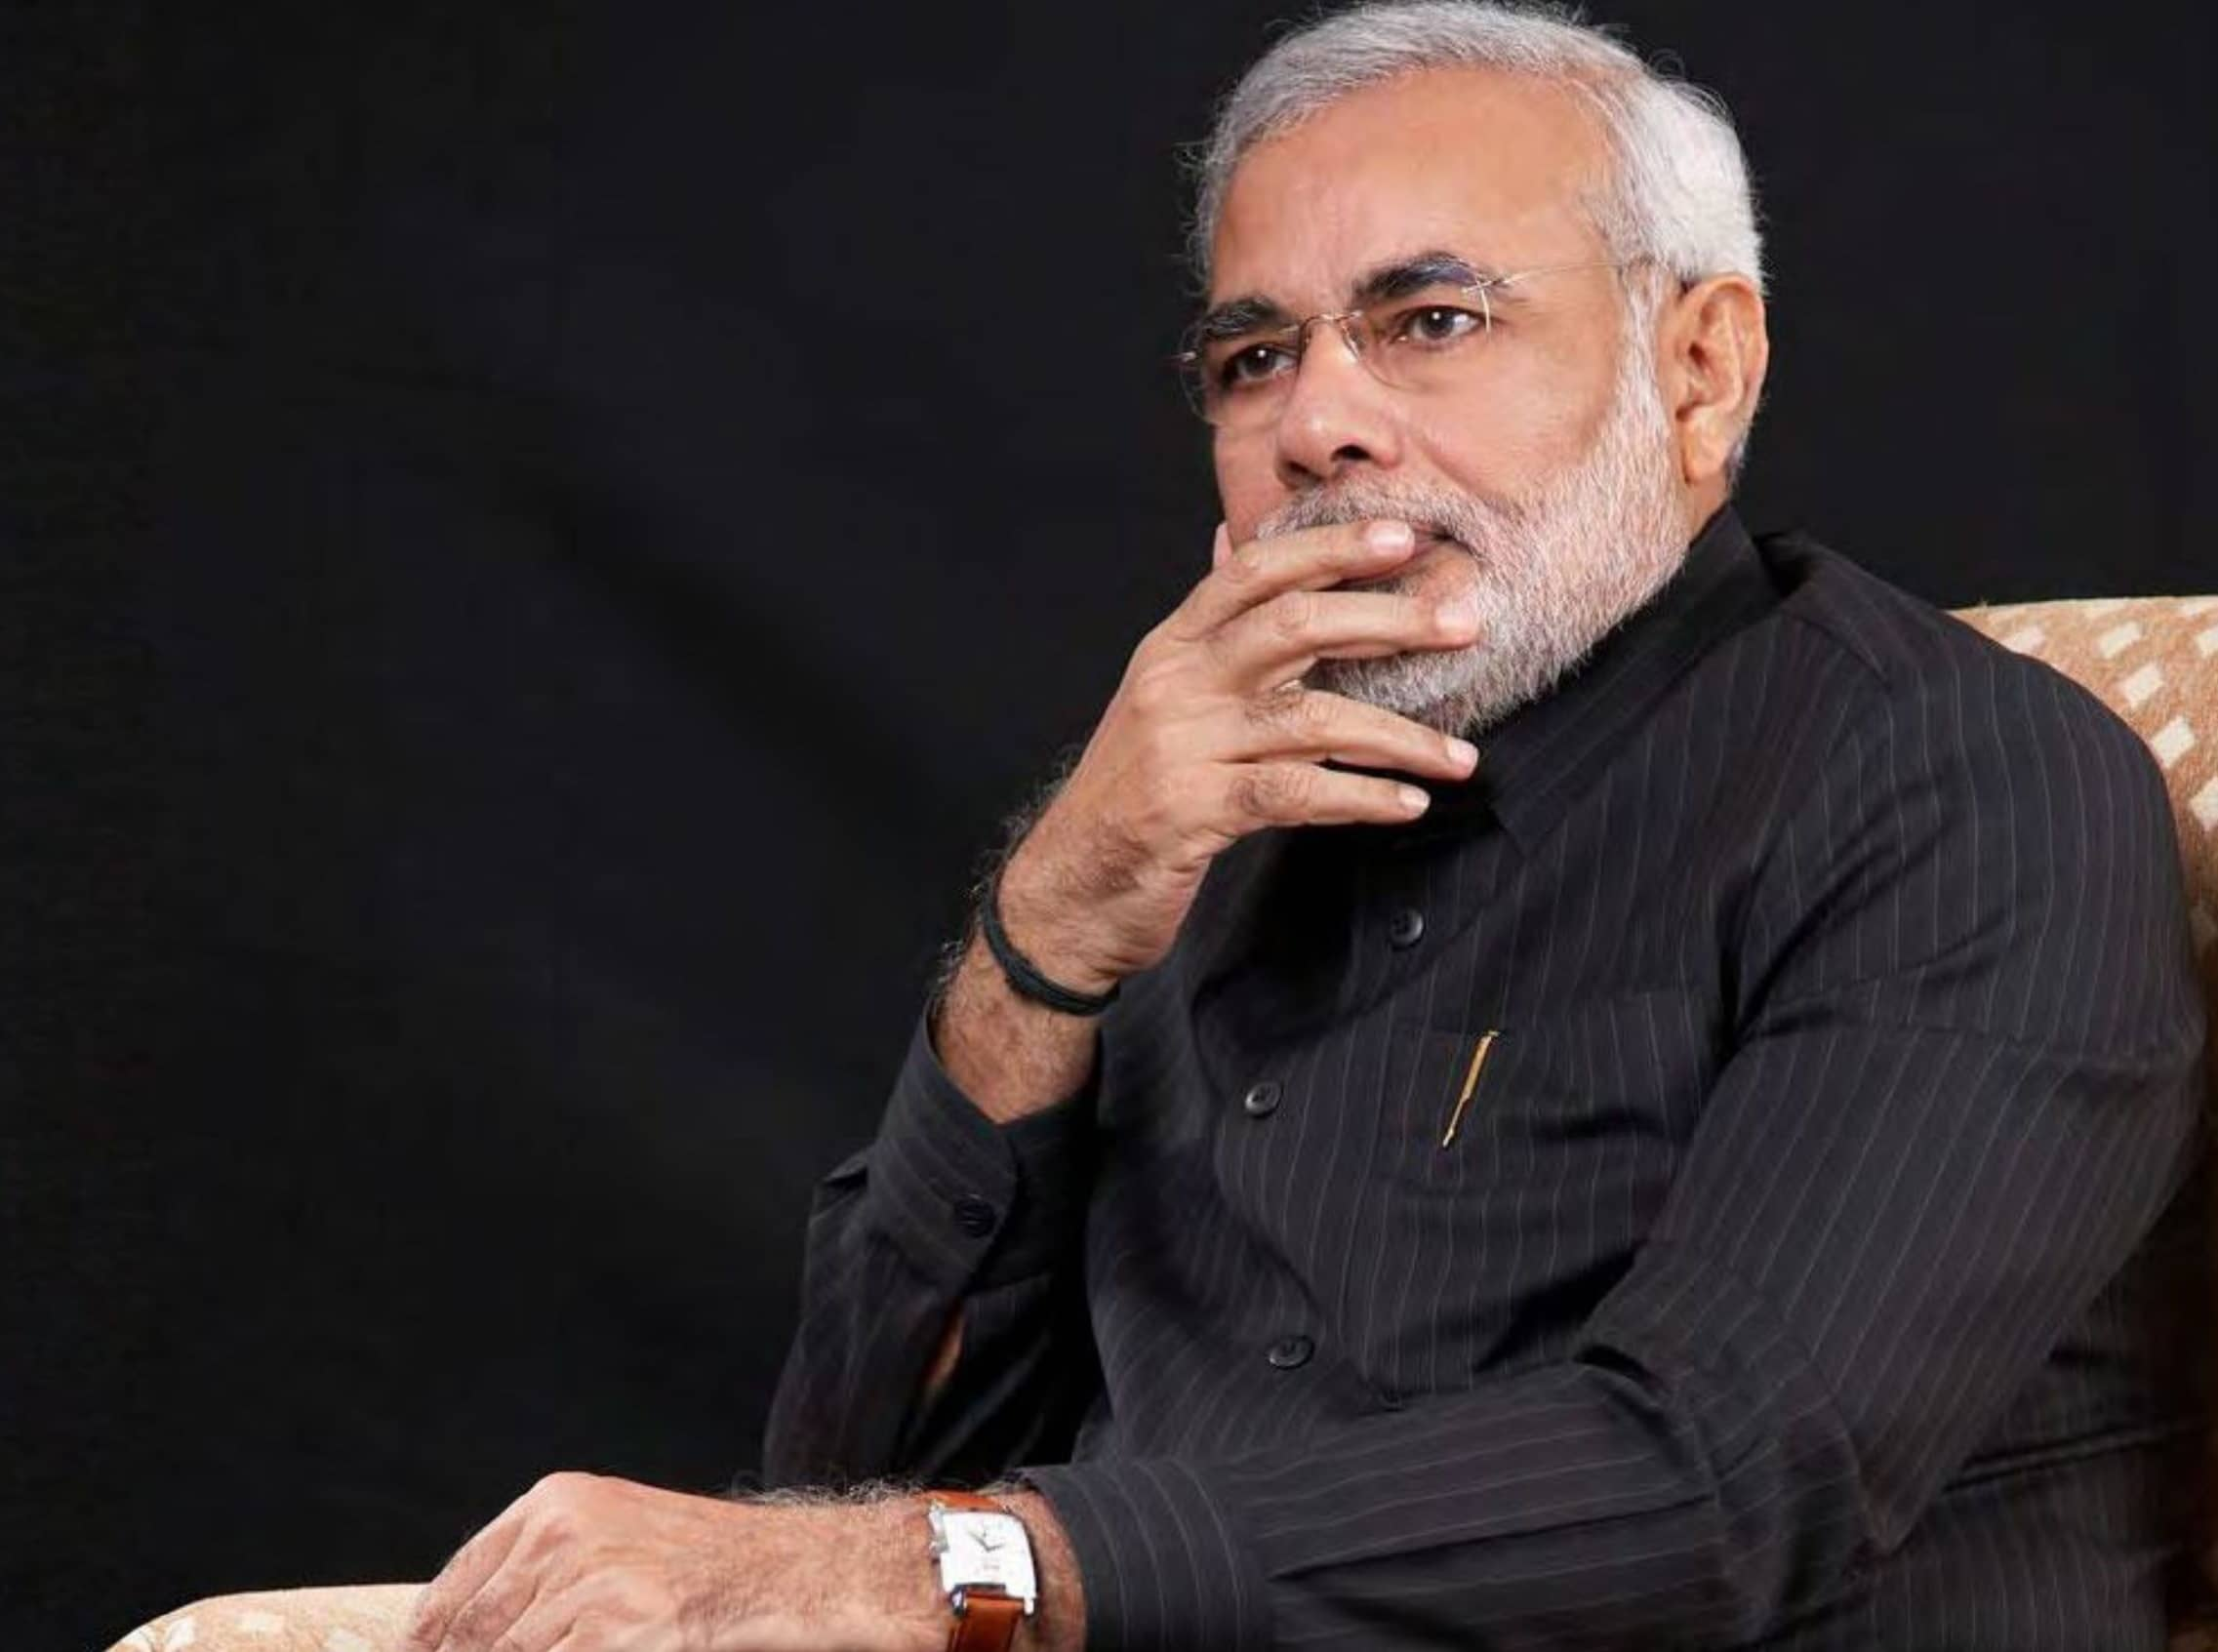 Modi 2.0: The Return Of Narendra Modi